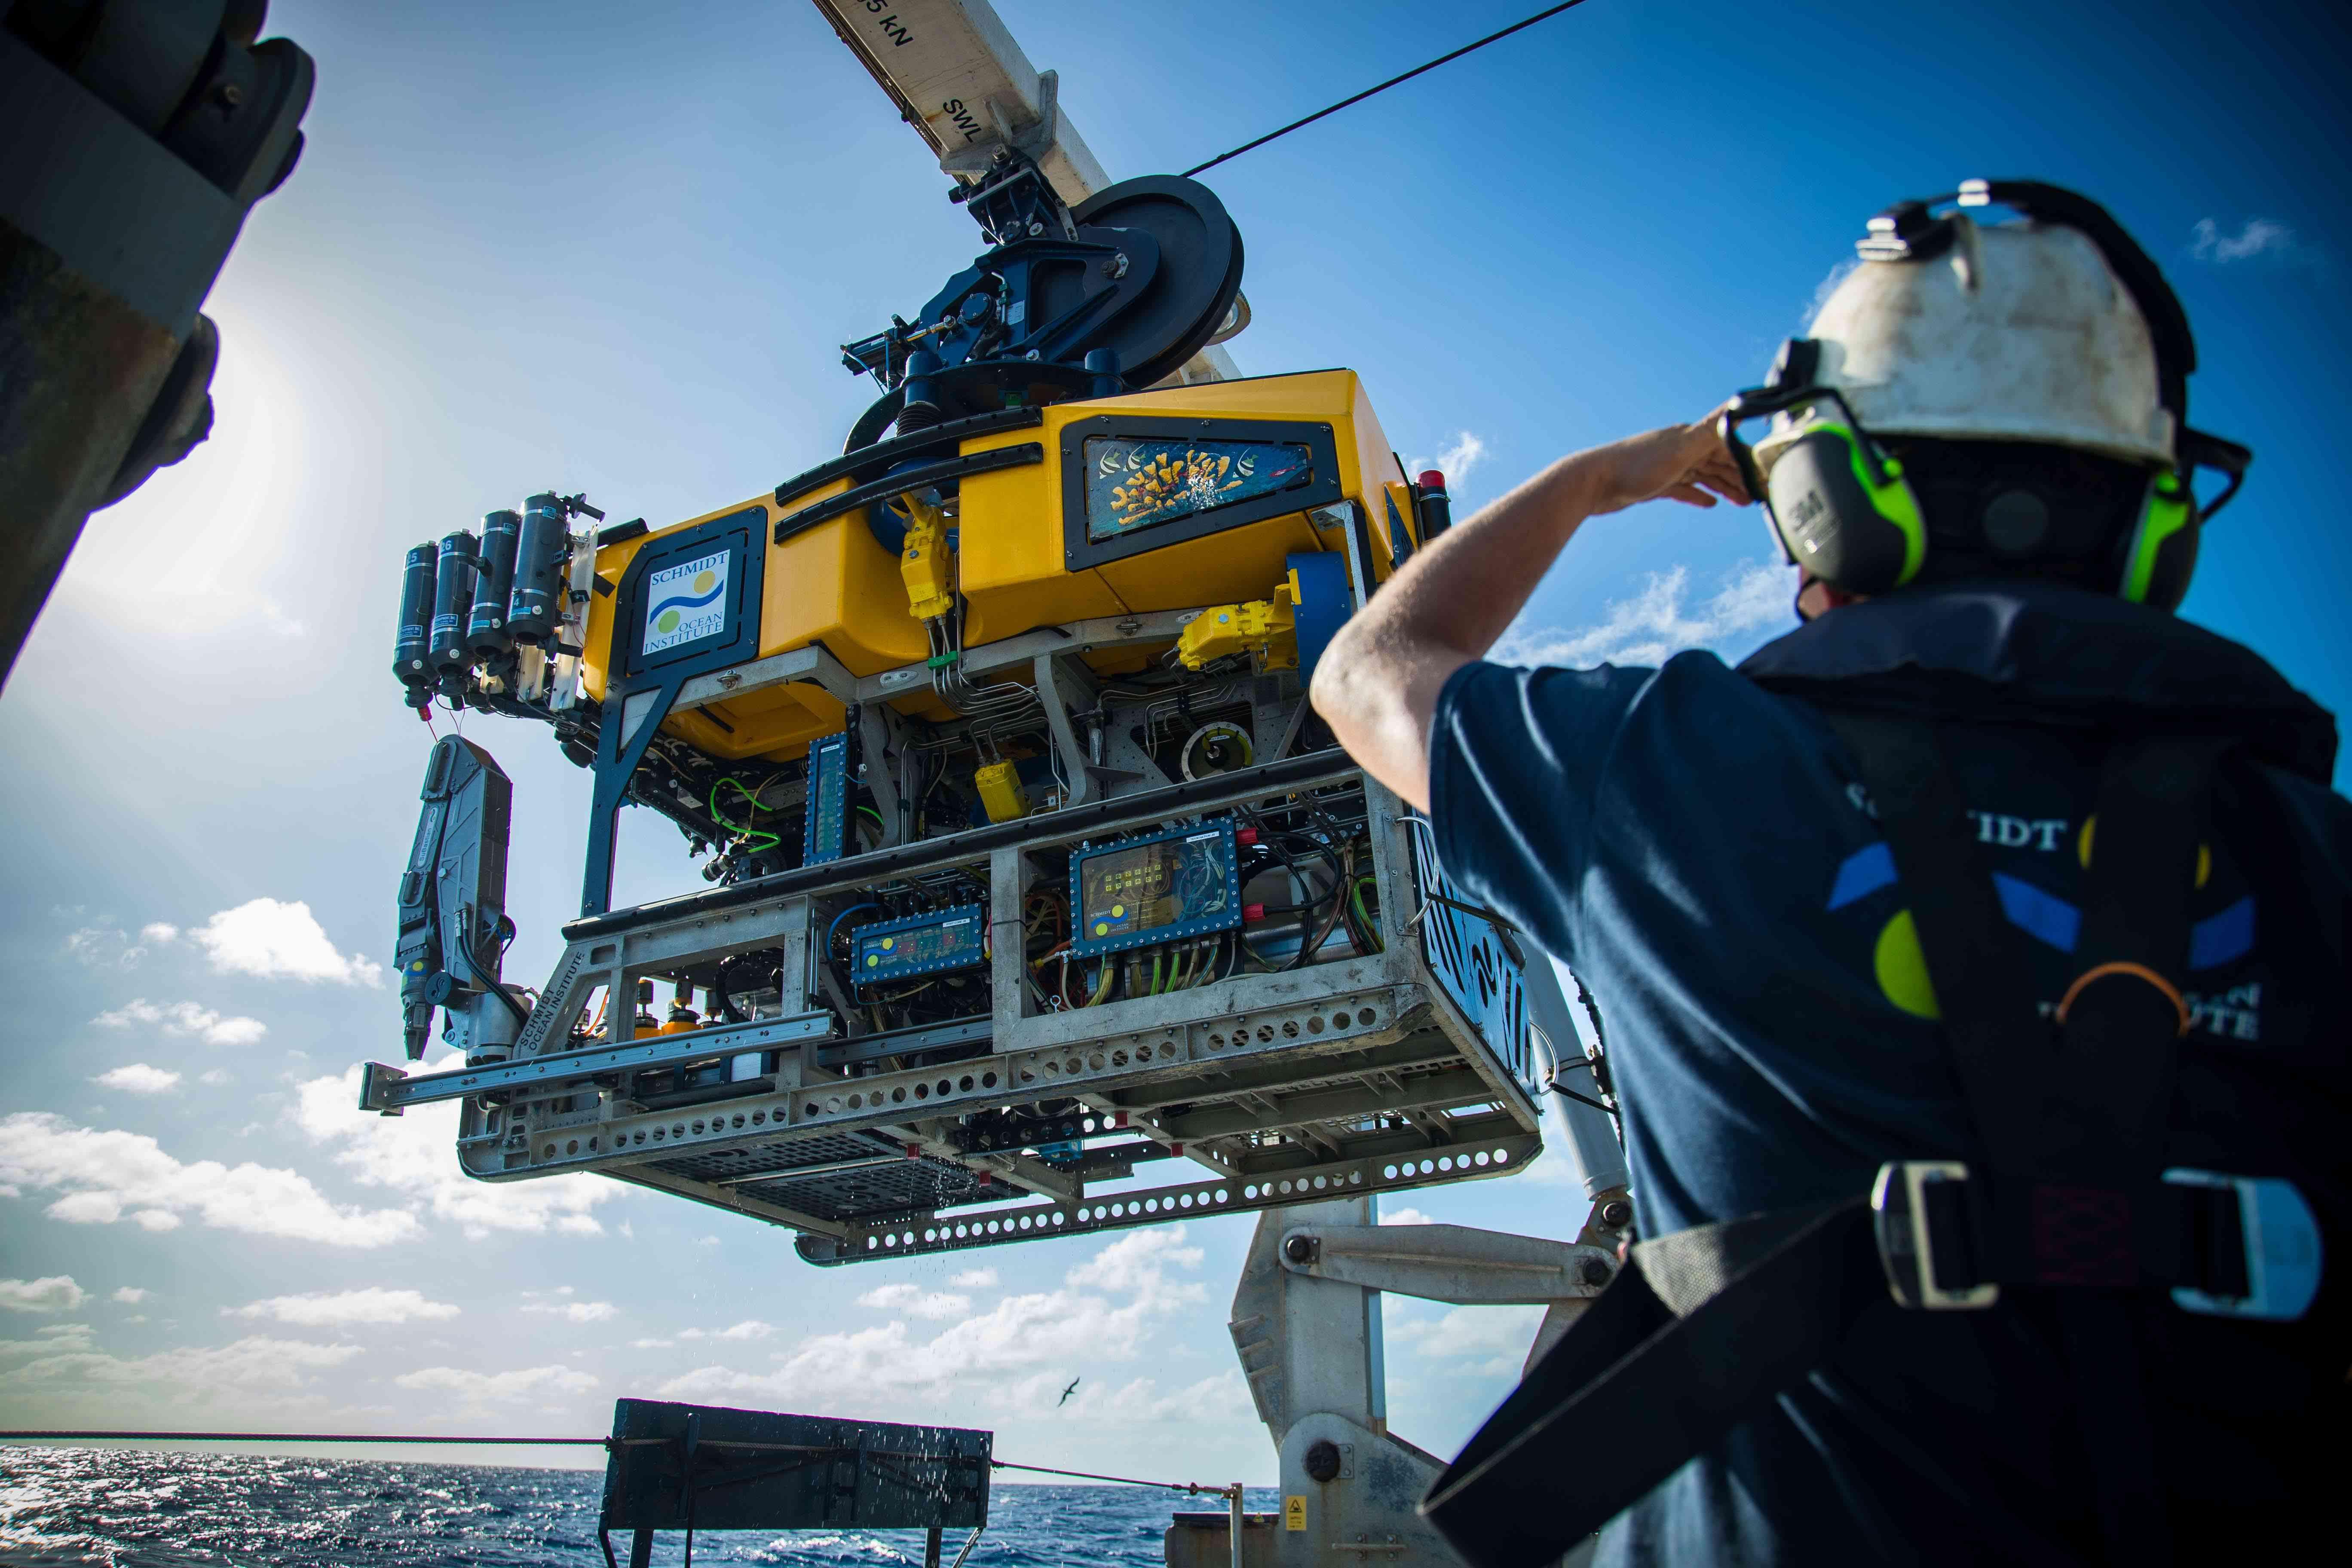 Underwater robot Subastian being deployed off of Falkor's back deck